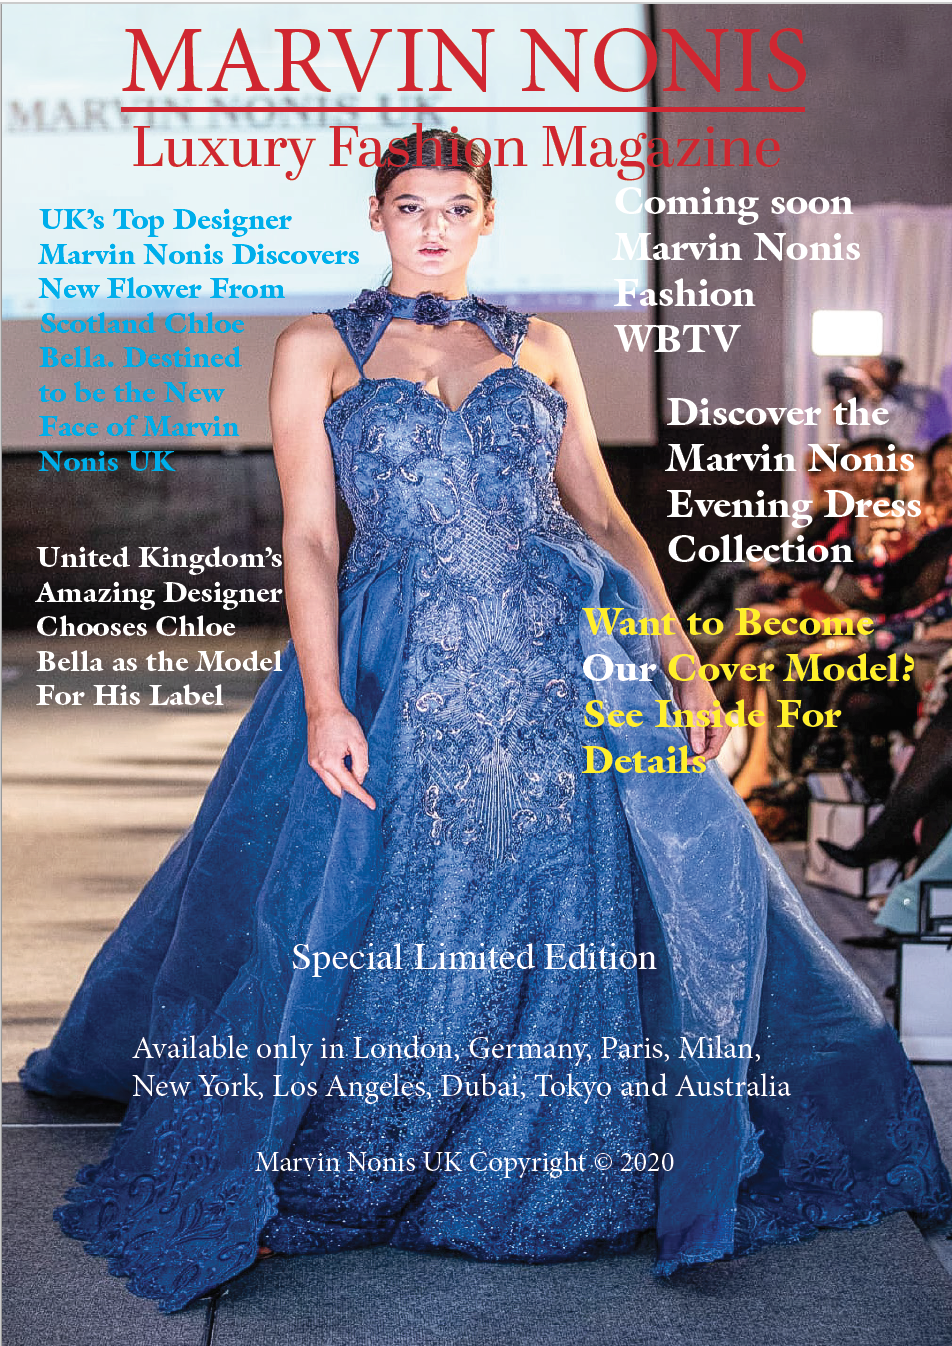 High End Designer Marvin Nonis Launches Luxury Fashion Magazine Pressat